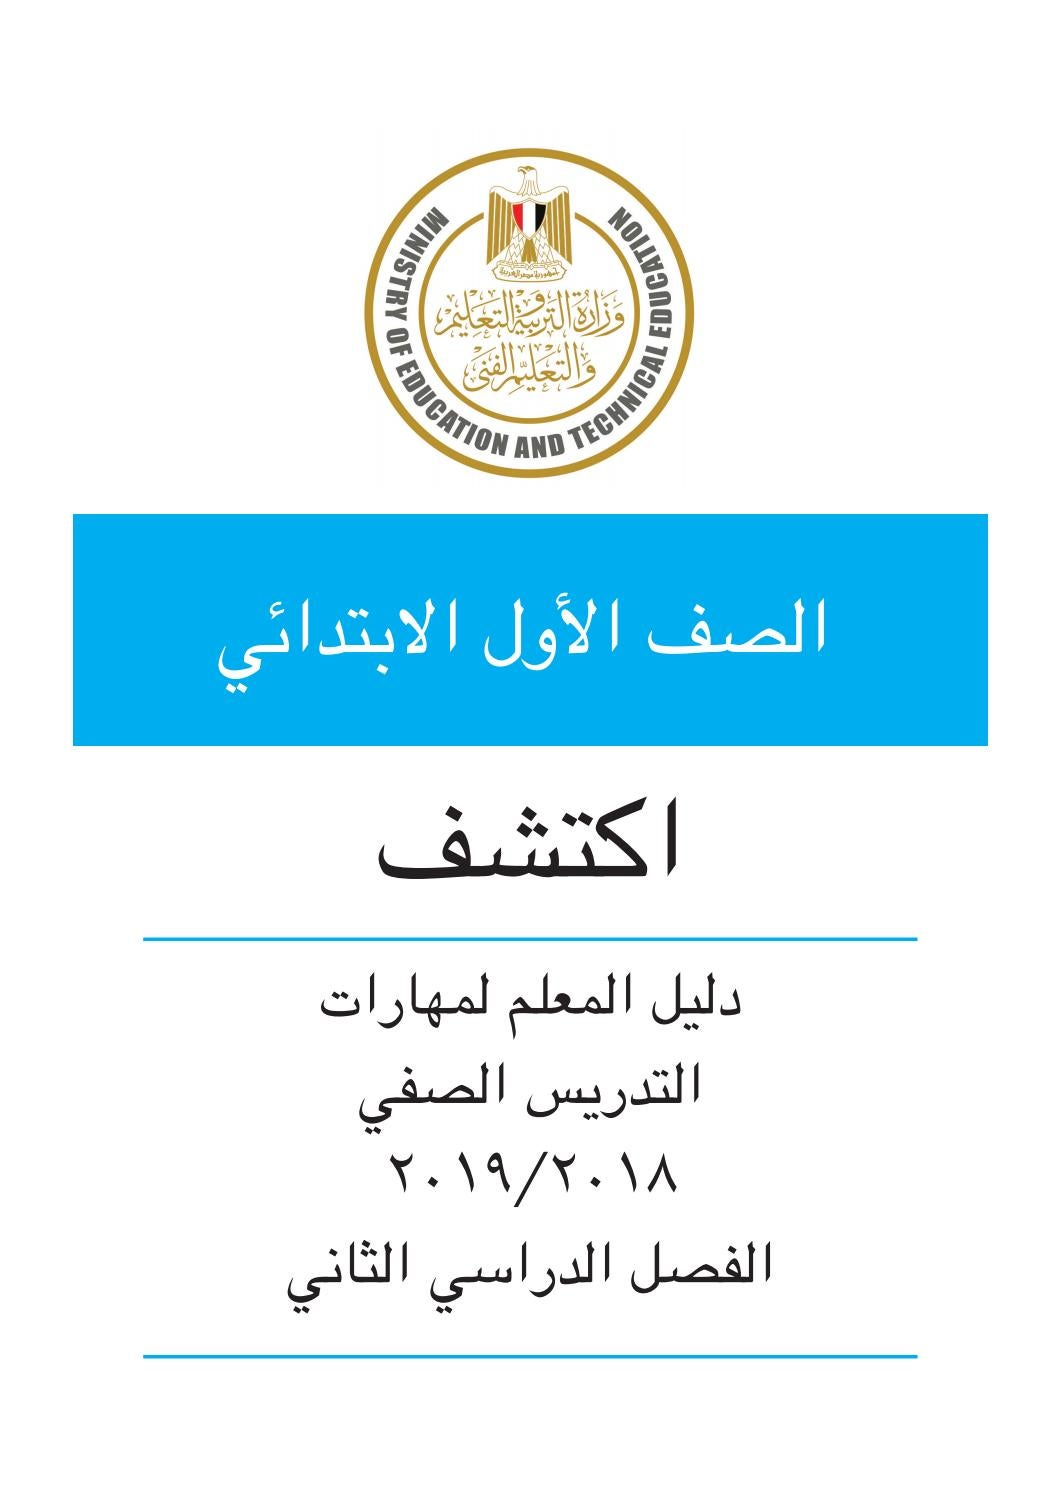 25f046c2f دليل-المعلم-الباقة-المجمعه-الأول-الإبتدائي-الترم-٢ by tshawki - issuu